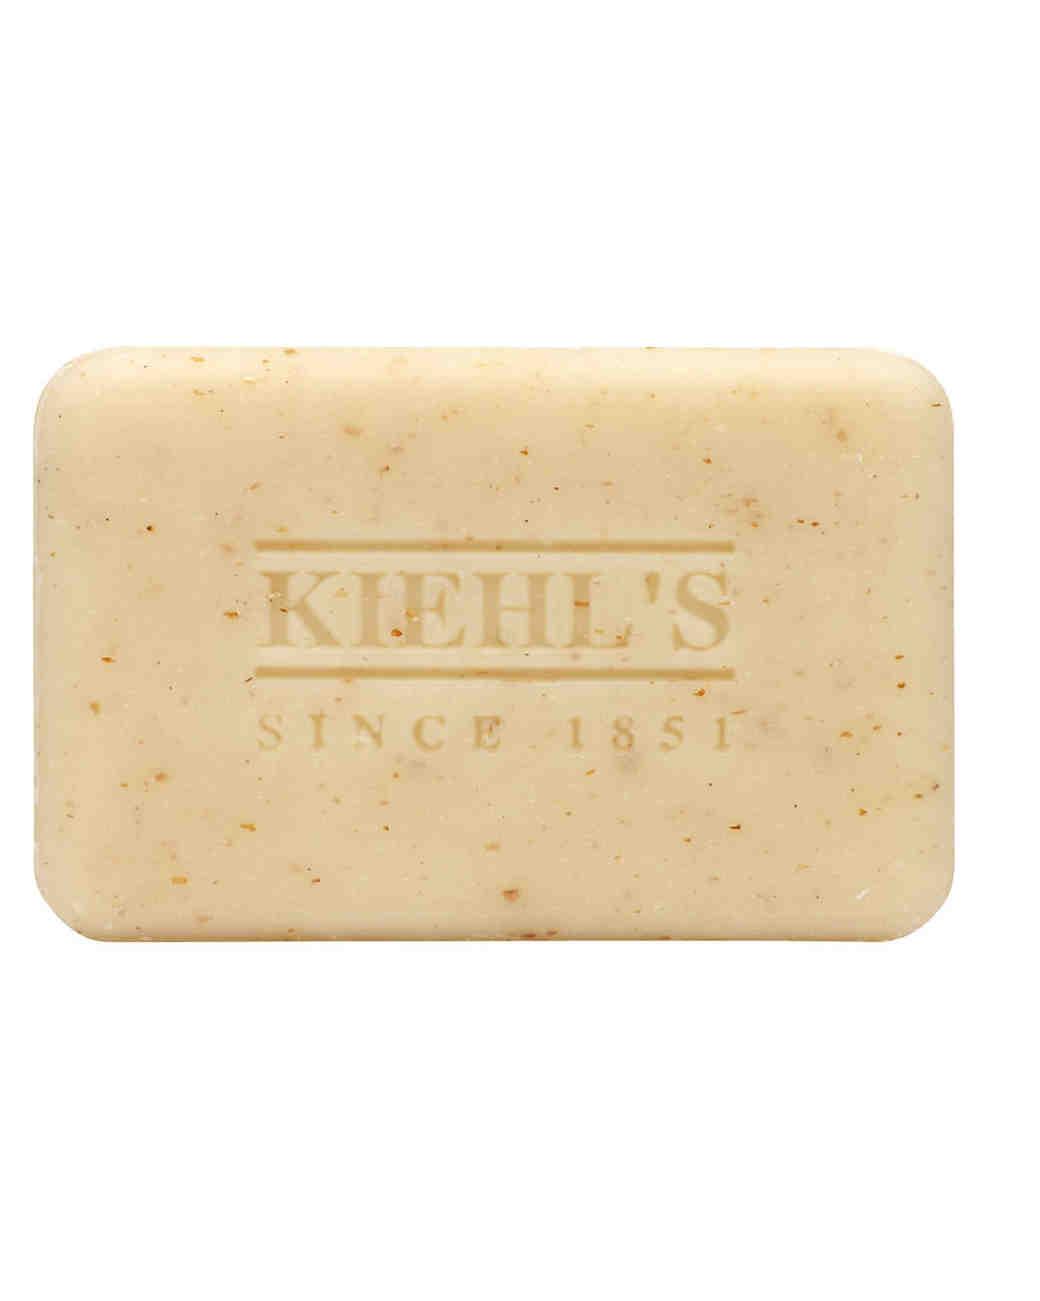 mens-grooming-products-kiehls-body-scrub-soap-bar-1114.jpg